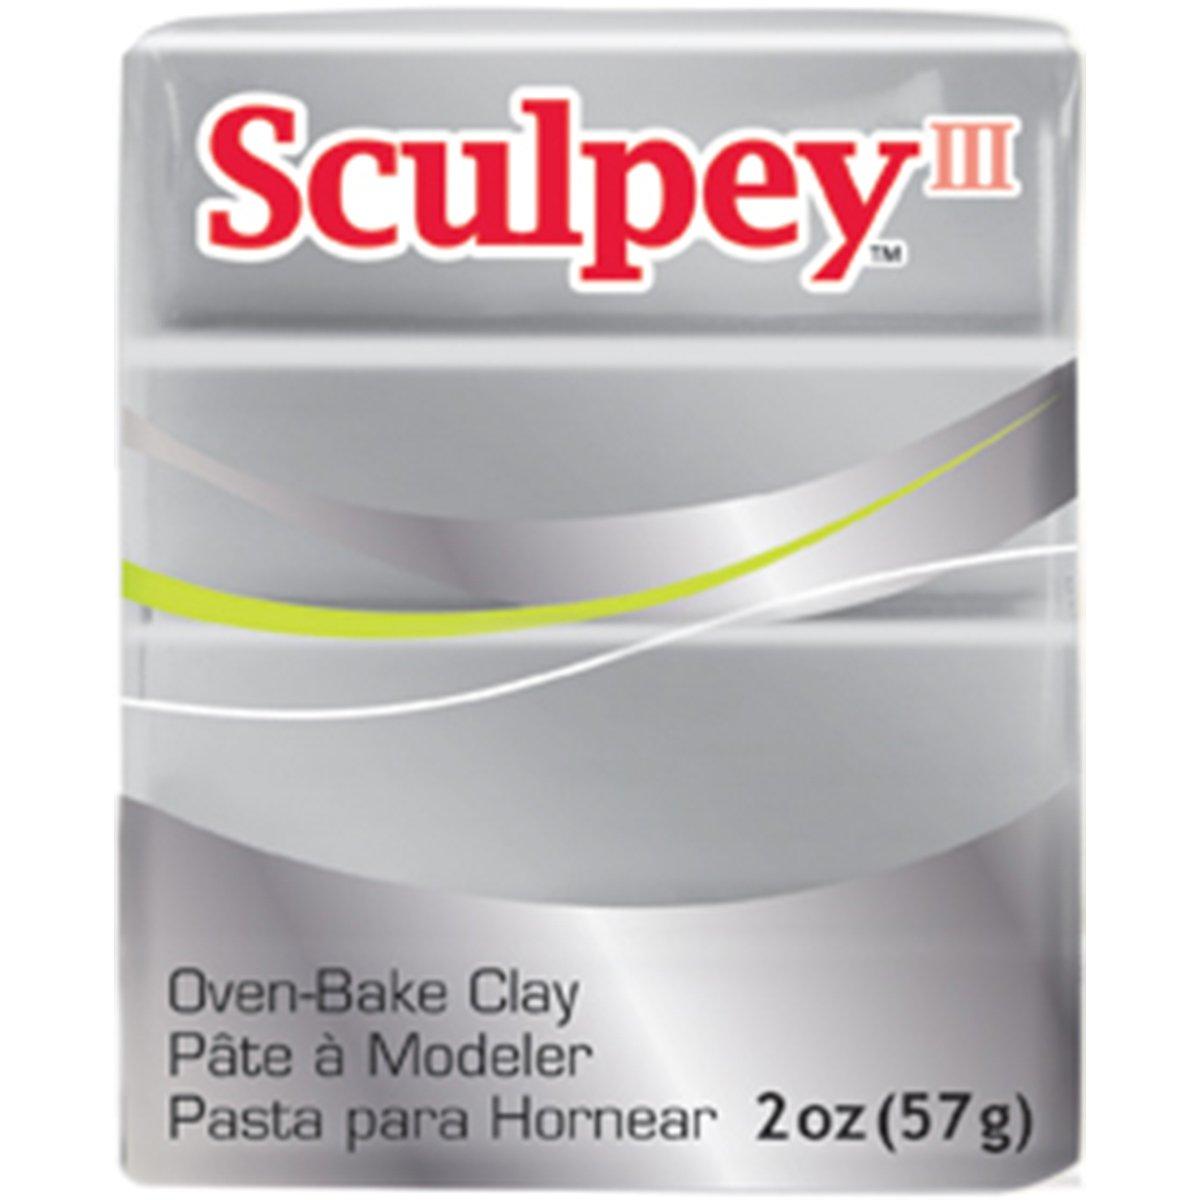 Polyform S302-1130 Sculpey-3 Polymer Clay, 2-Ounce, Silver